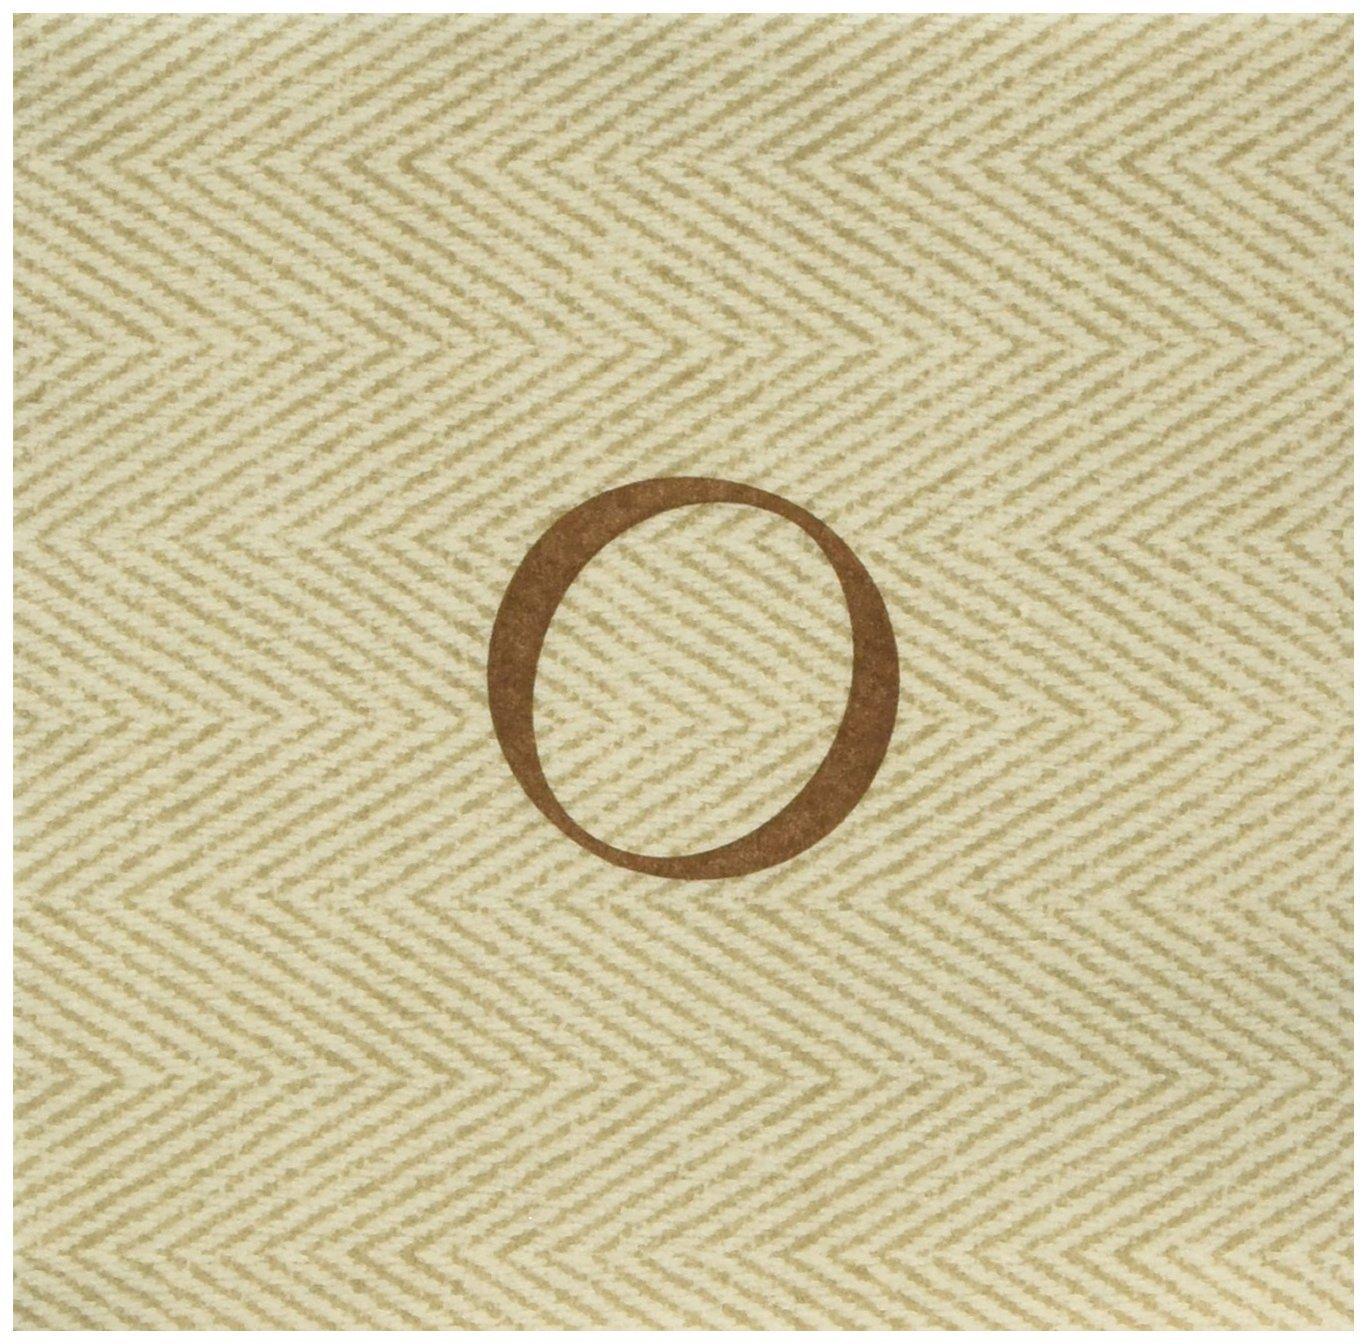 Monogram Paper Napkins Uk: Caspari Jute Herringbone Paper Linen Monogram Initial O